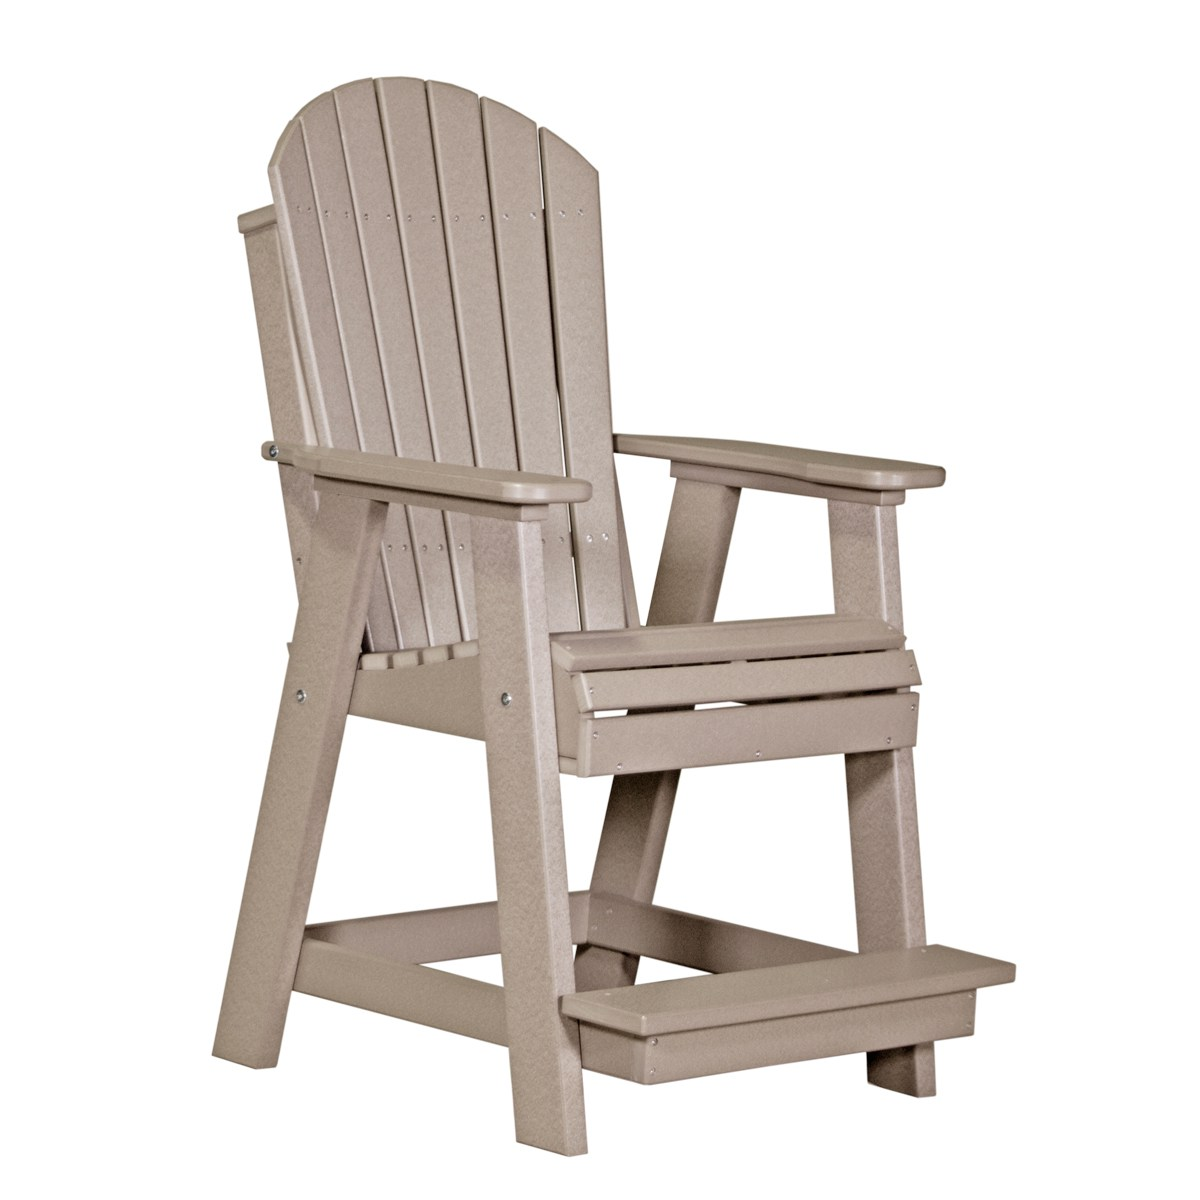 non wood adirondack chairs christmas chair covers dubai balcony recycled patio fine oak things